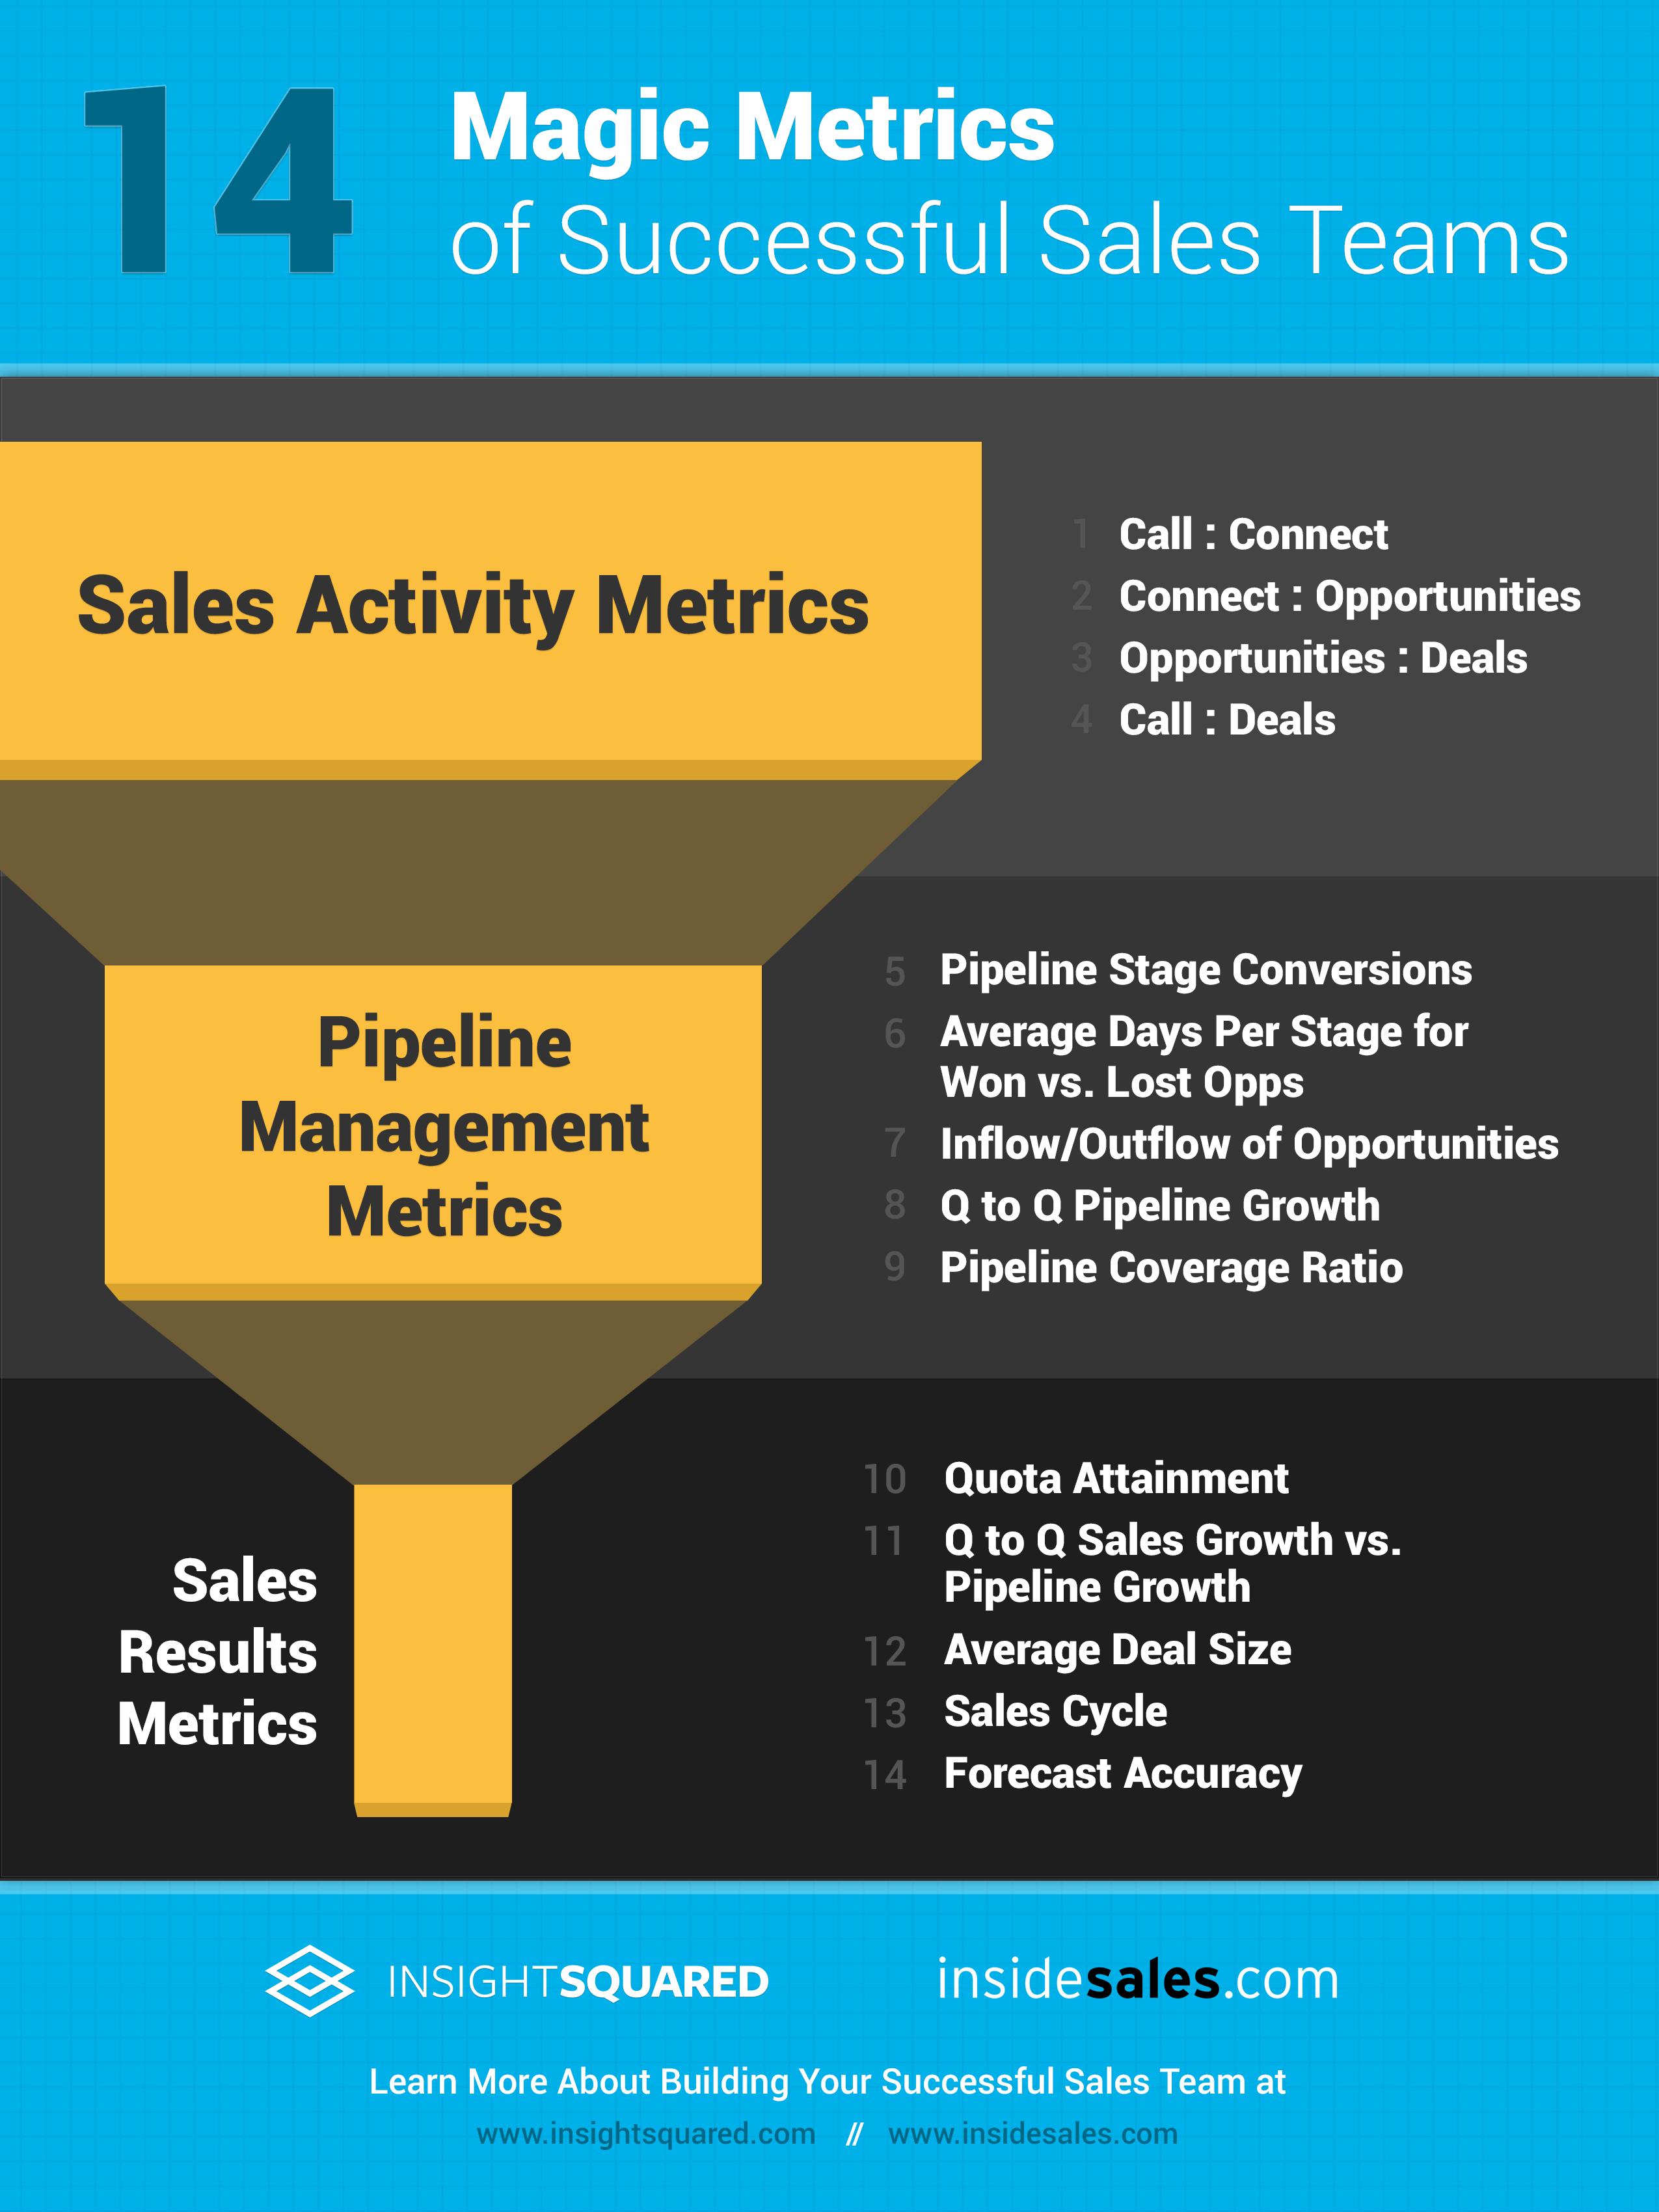 sales_infographic_v2.png